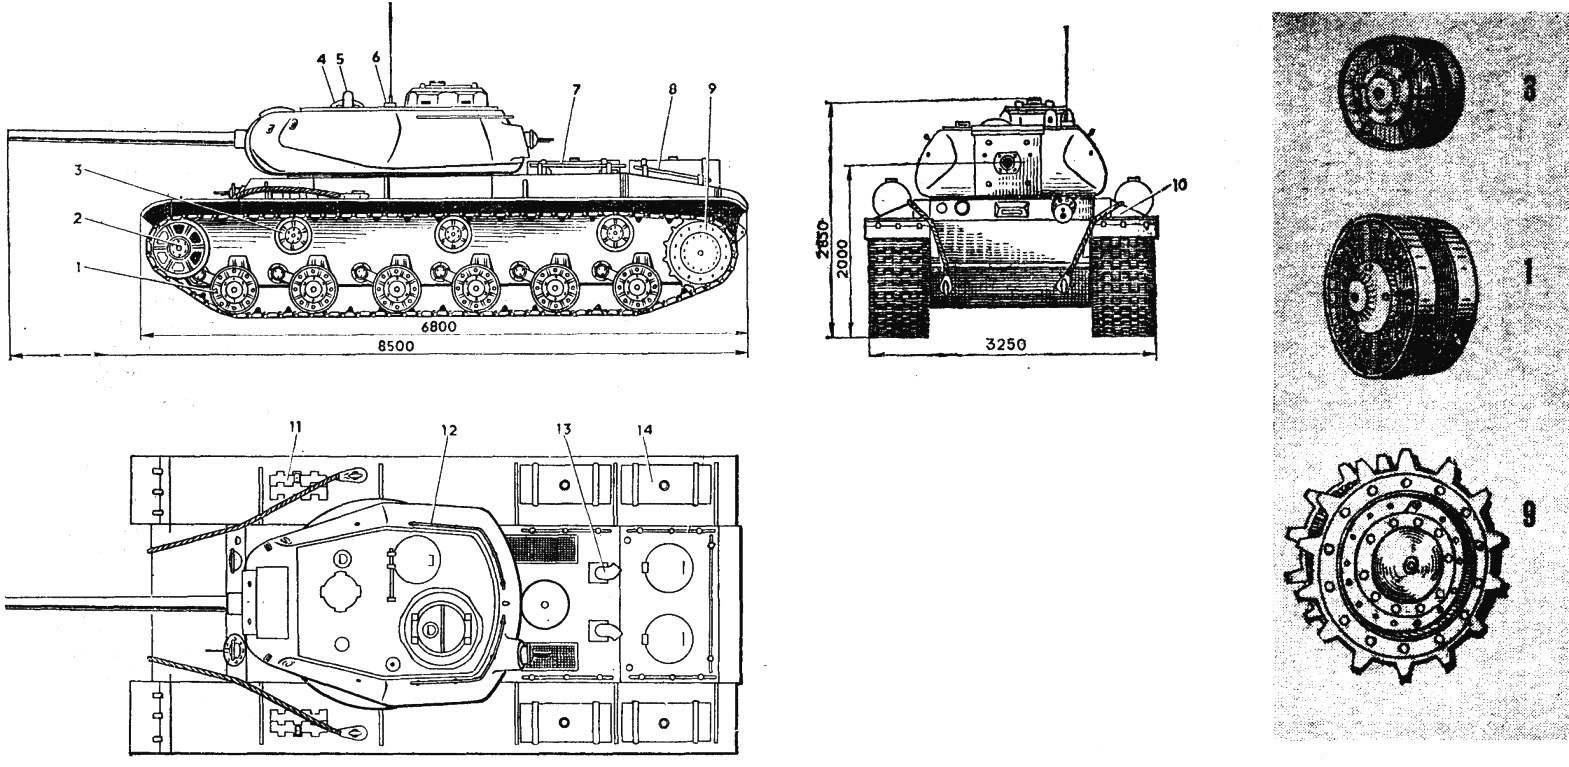 Рис. 6. Тяжелый танк КВ-85